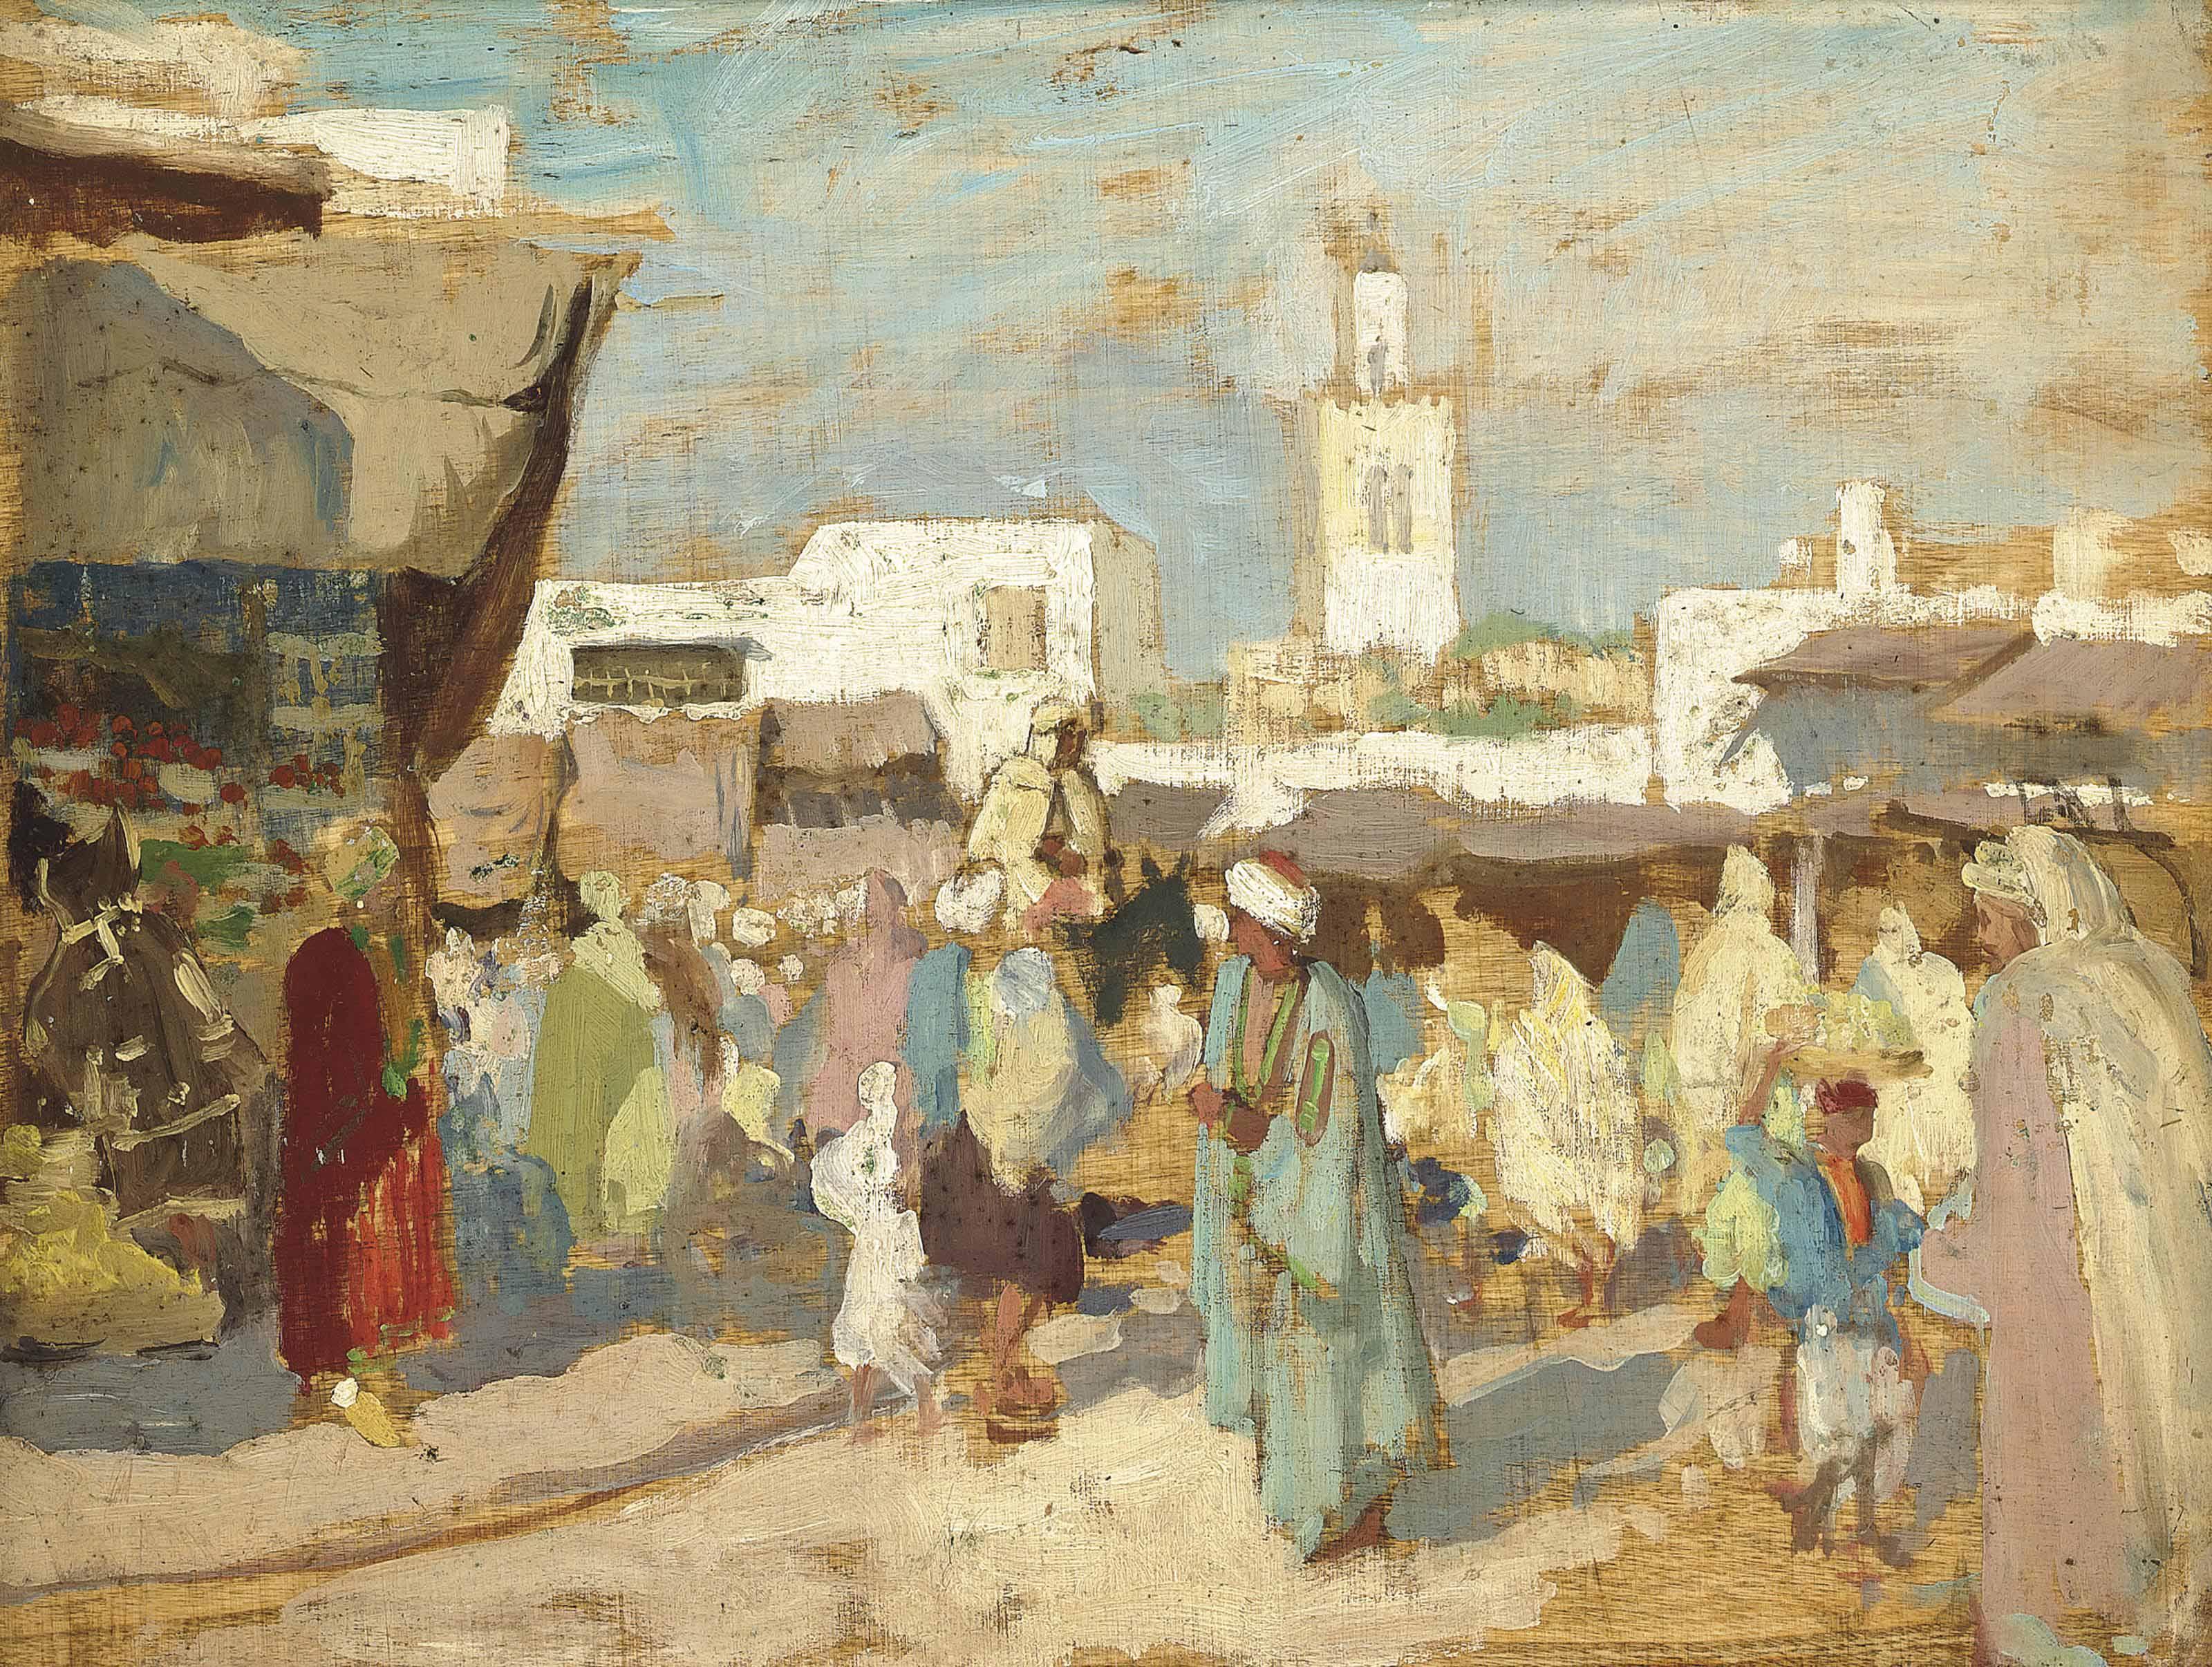 Eastern Bazaar